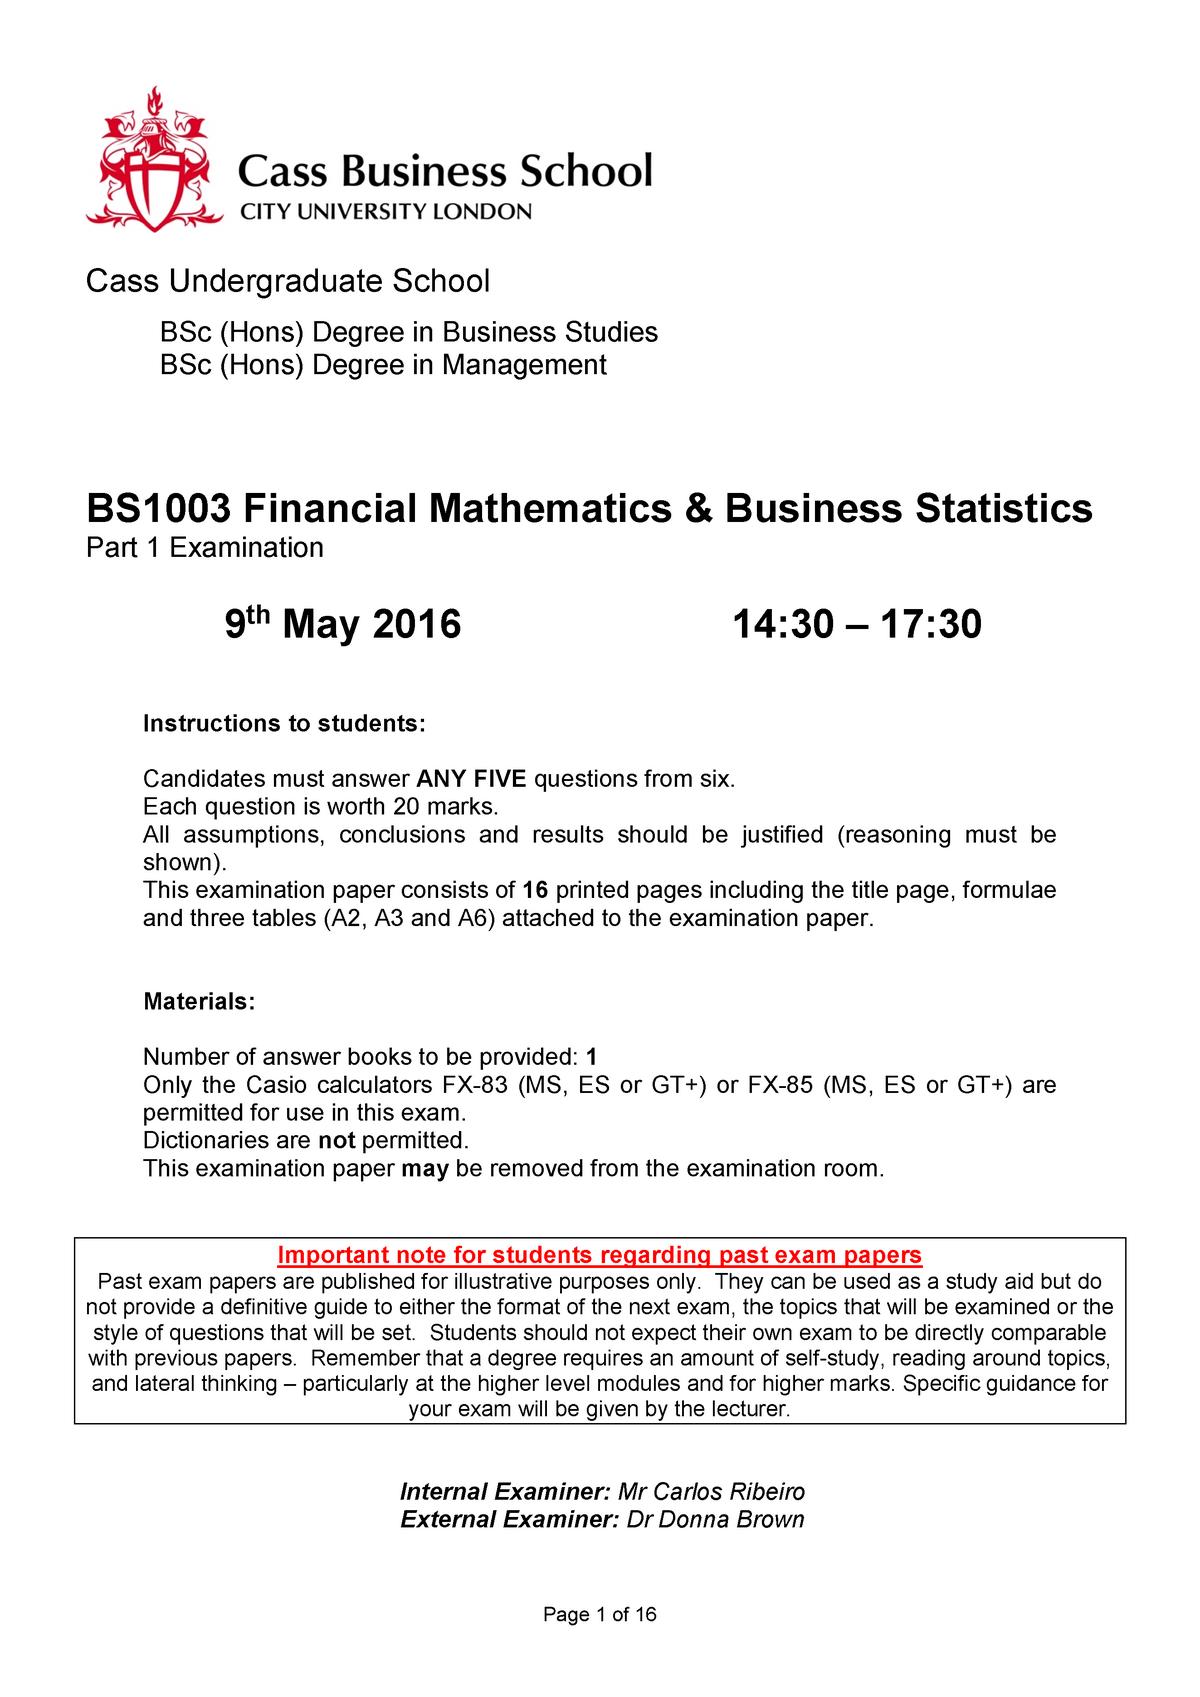 Exam 2016 - BS1003: Financial Mathematics and Business Statistics